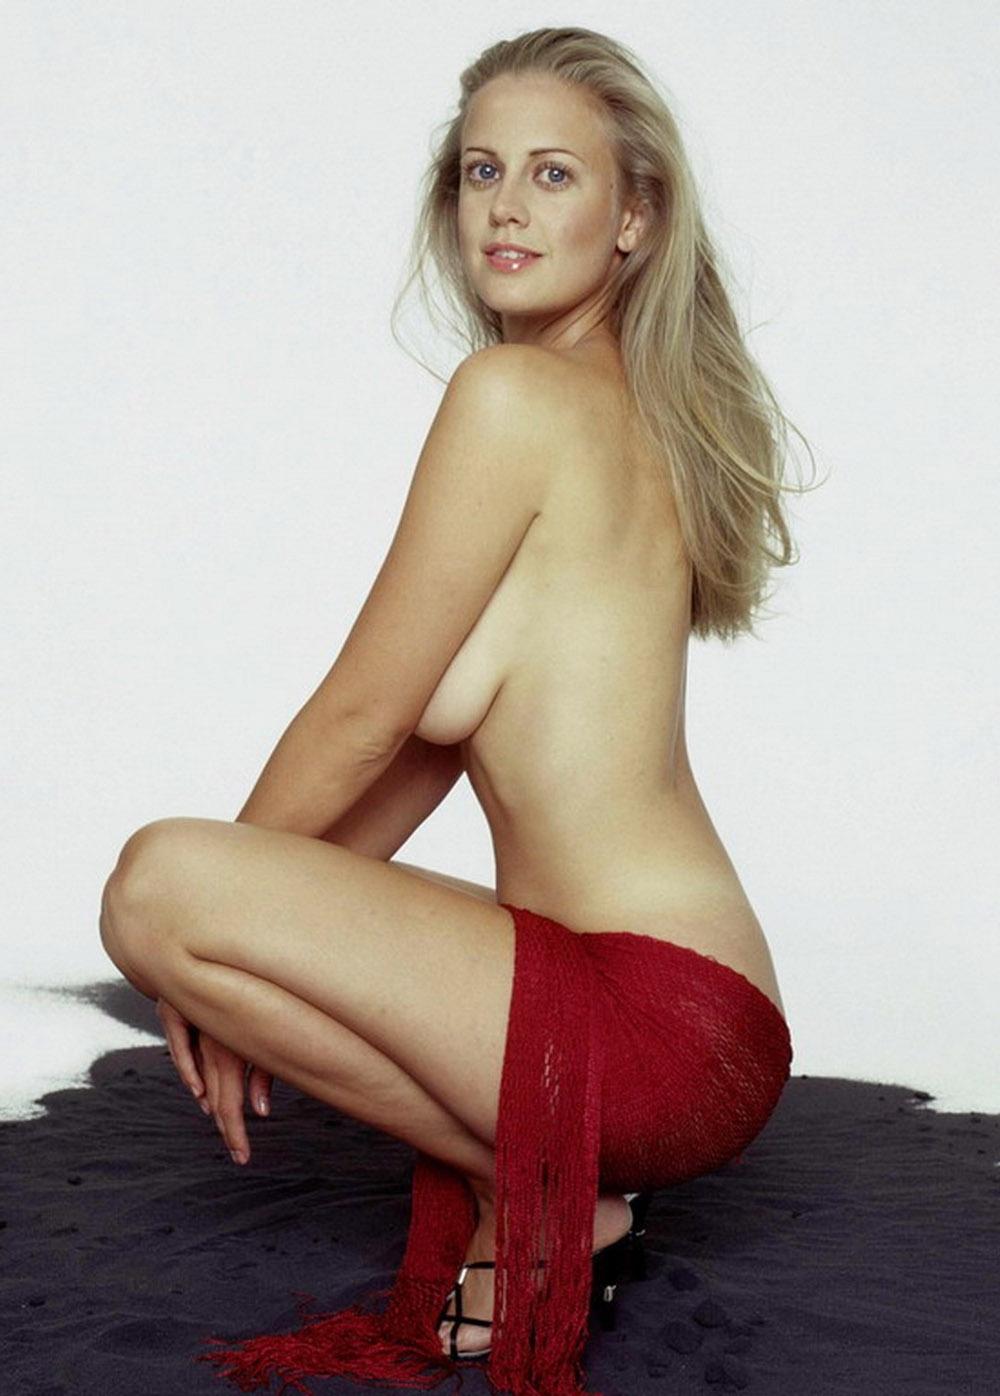 Nude schöneberger Barbara Schoeneberger